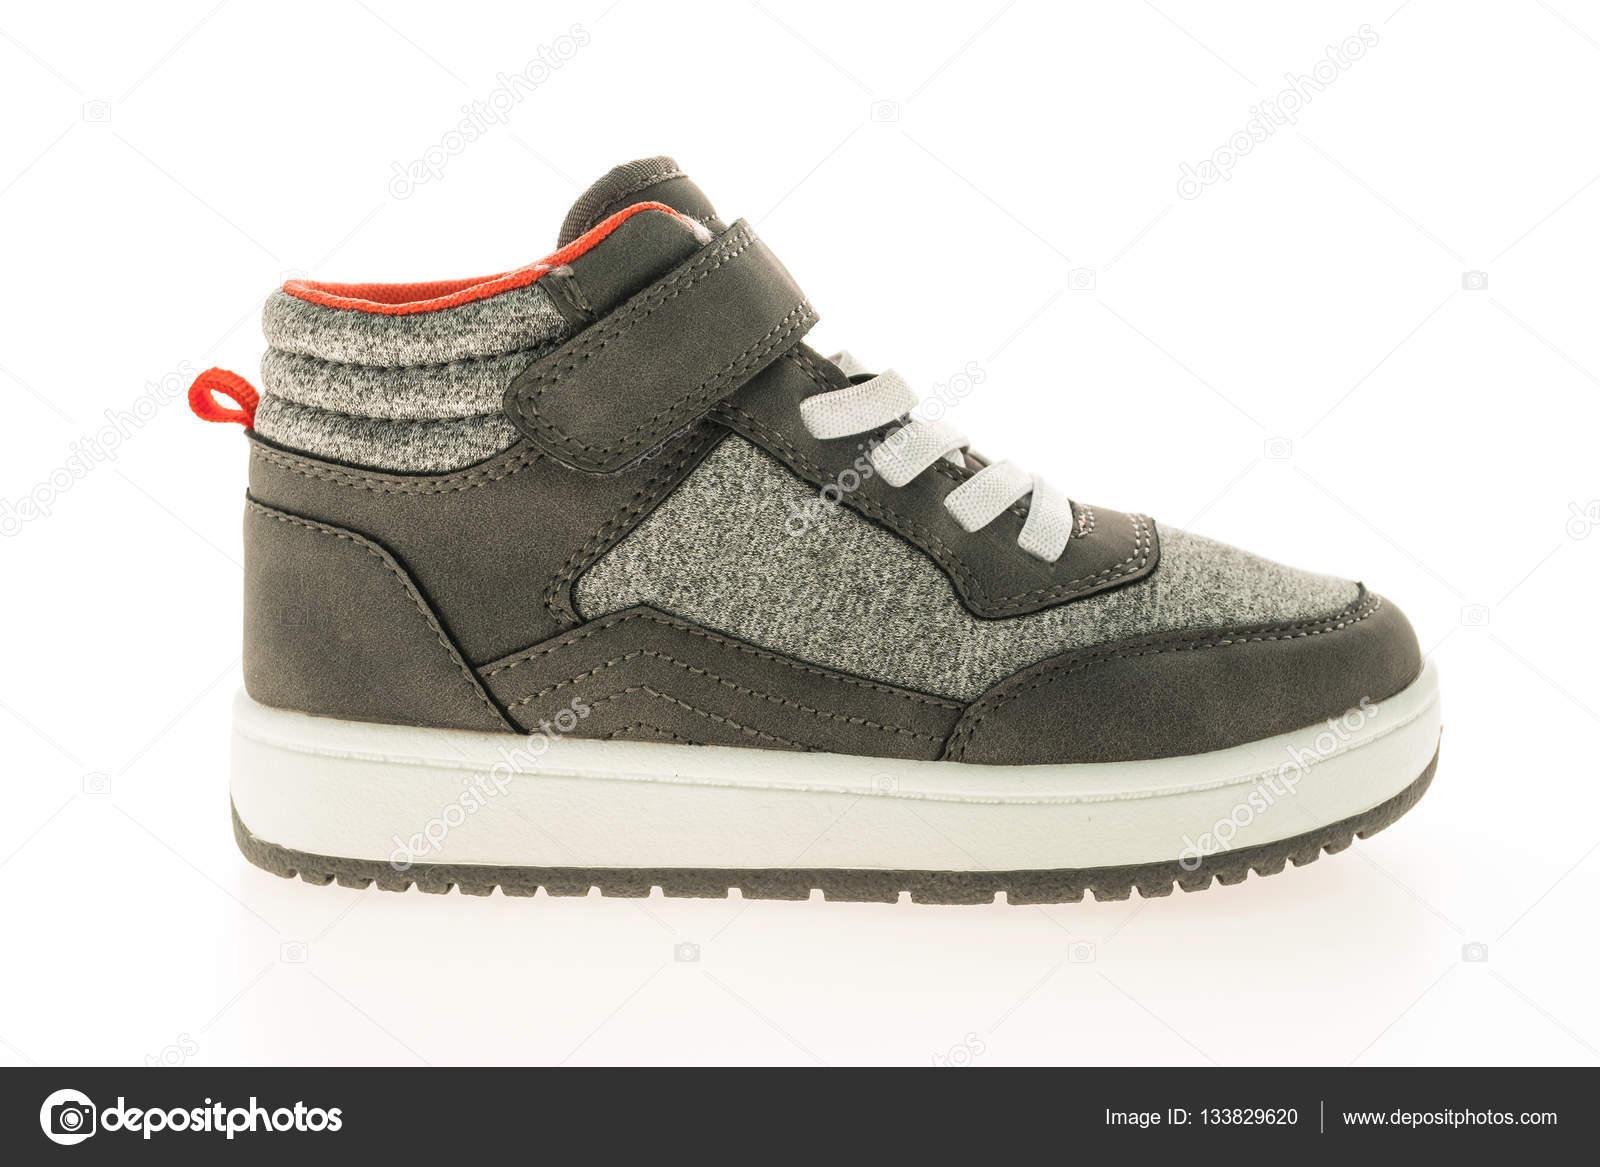 76427adfb8c Μόδα παπούτσια και αθλητικά — Φωτογραφία Αρχείου © mrsiraphol #133829620